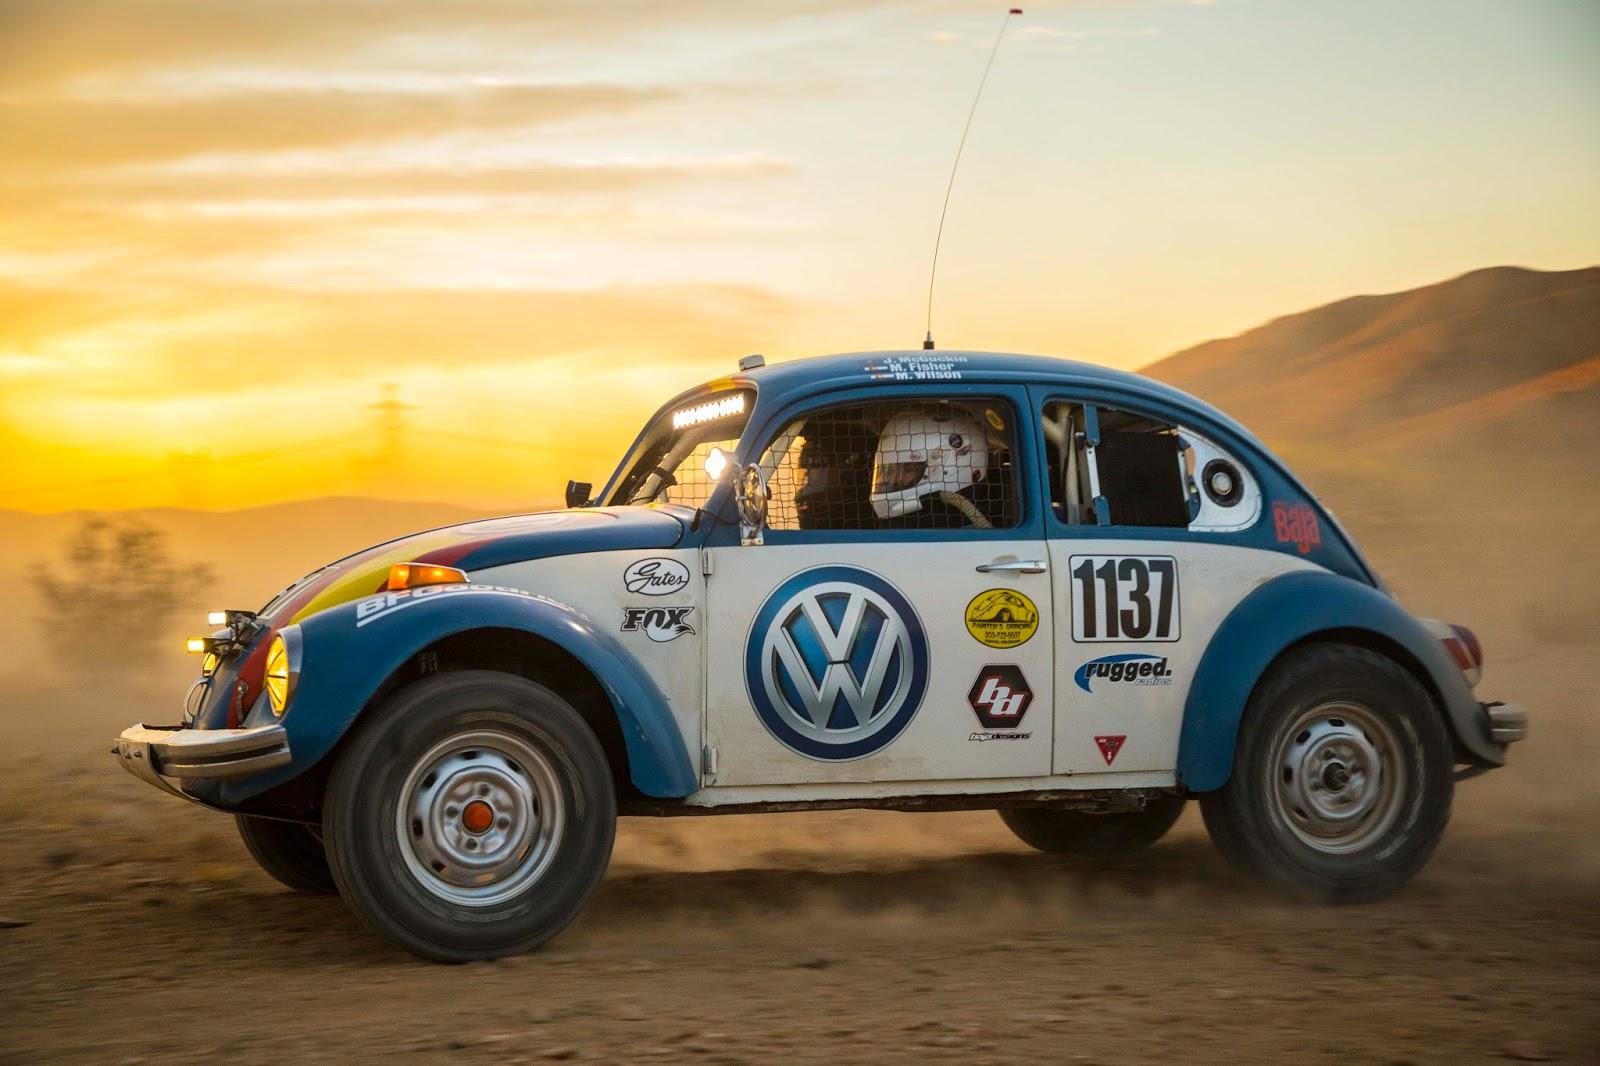 VW Sponsors Project Baja